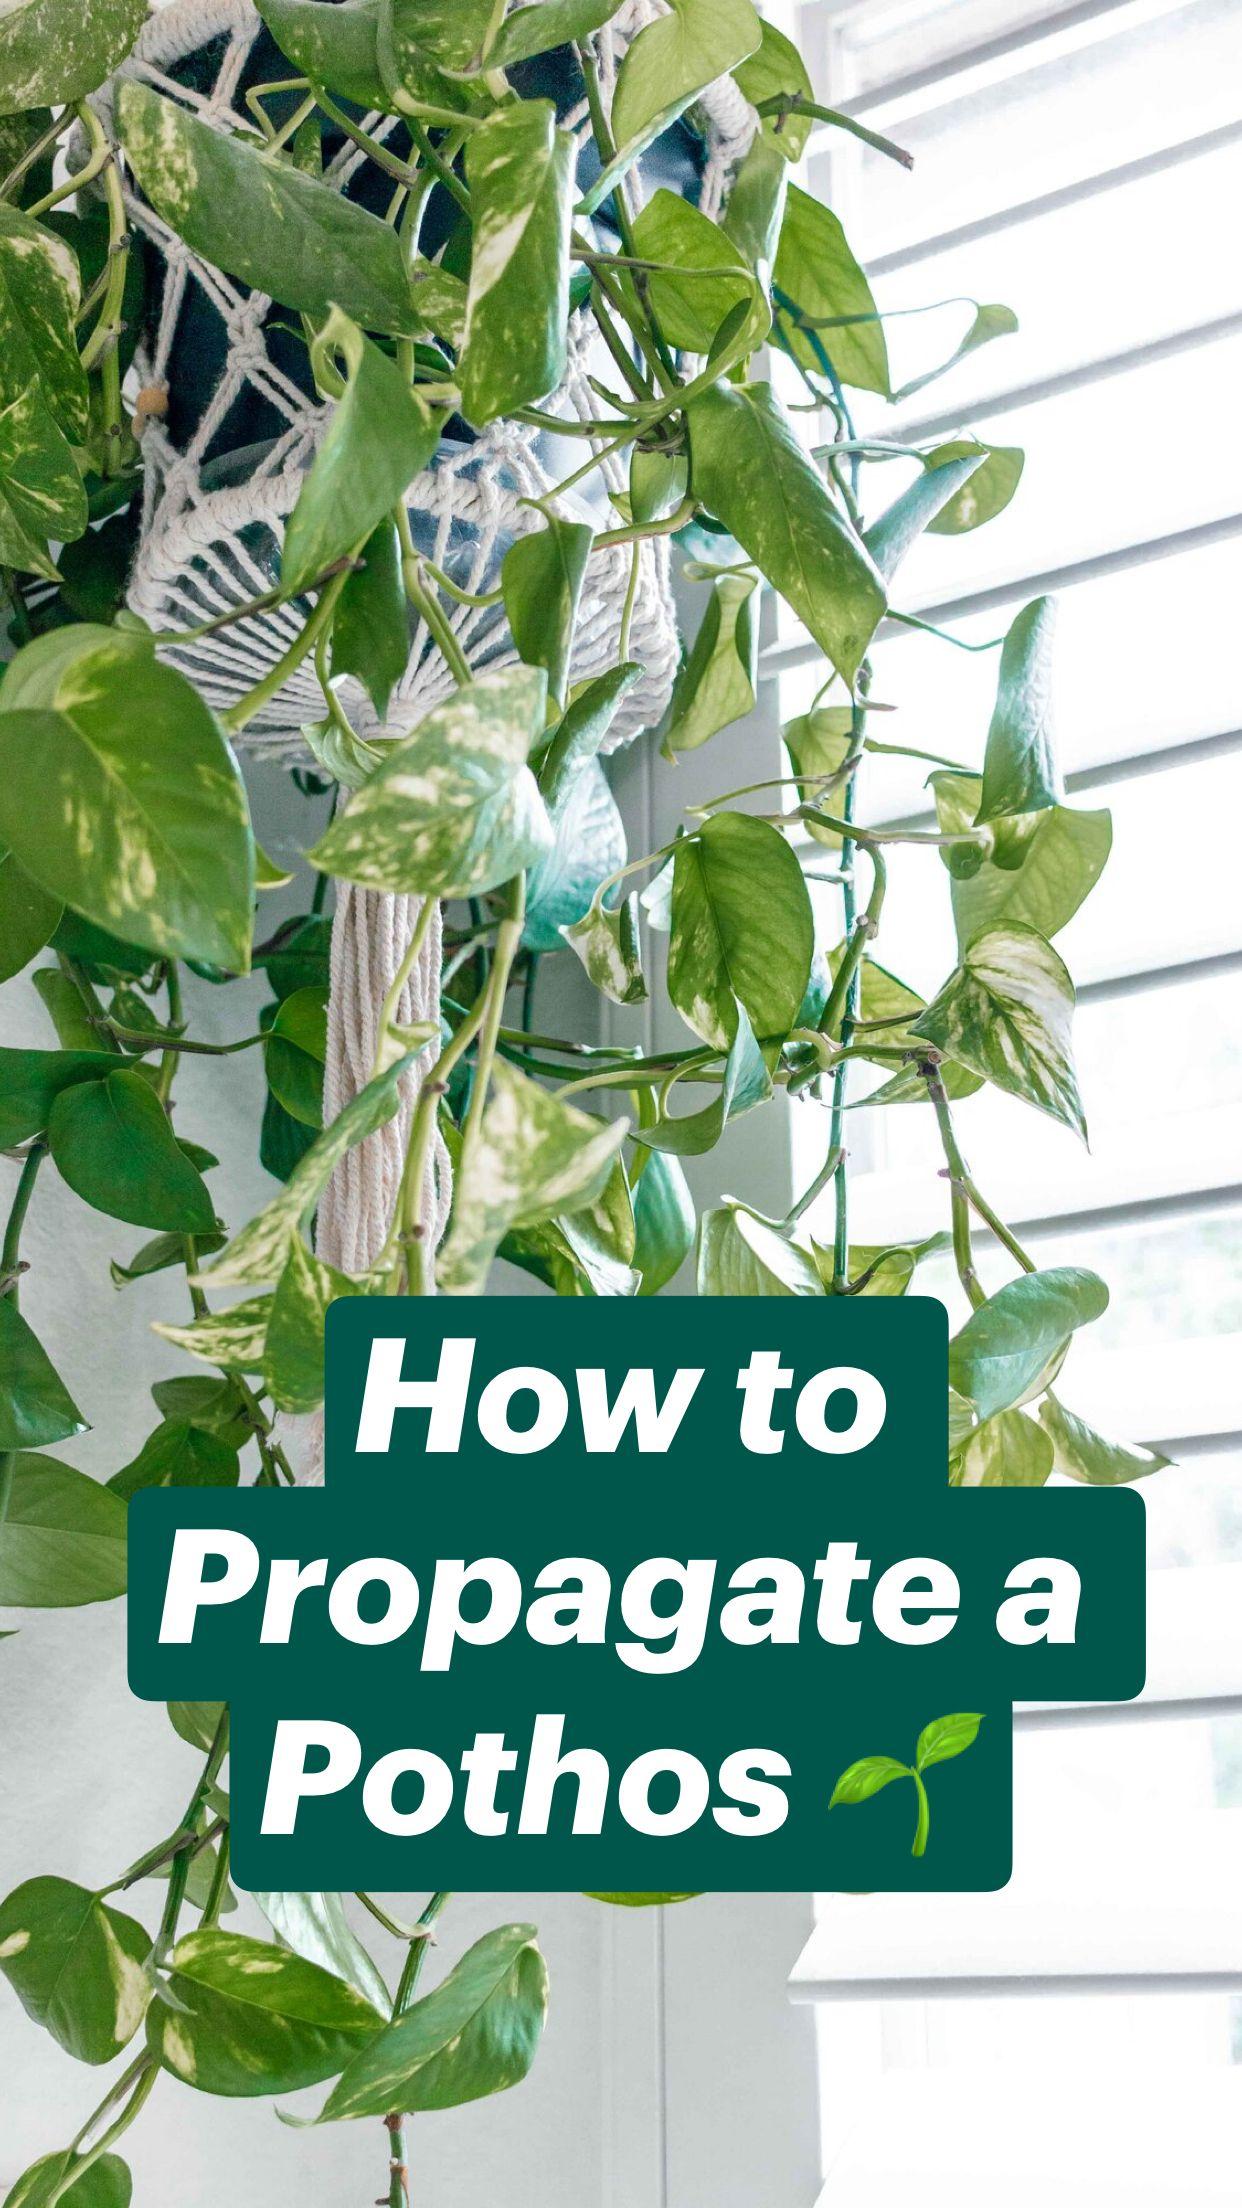 How to Propagate a Pothos 🌱